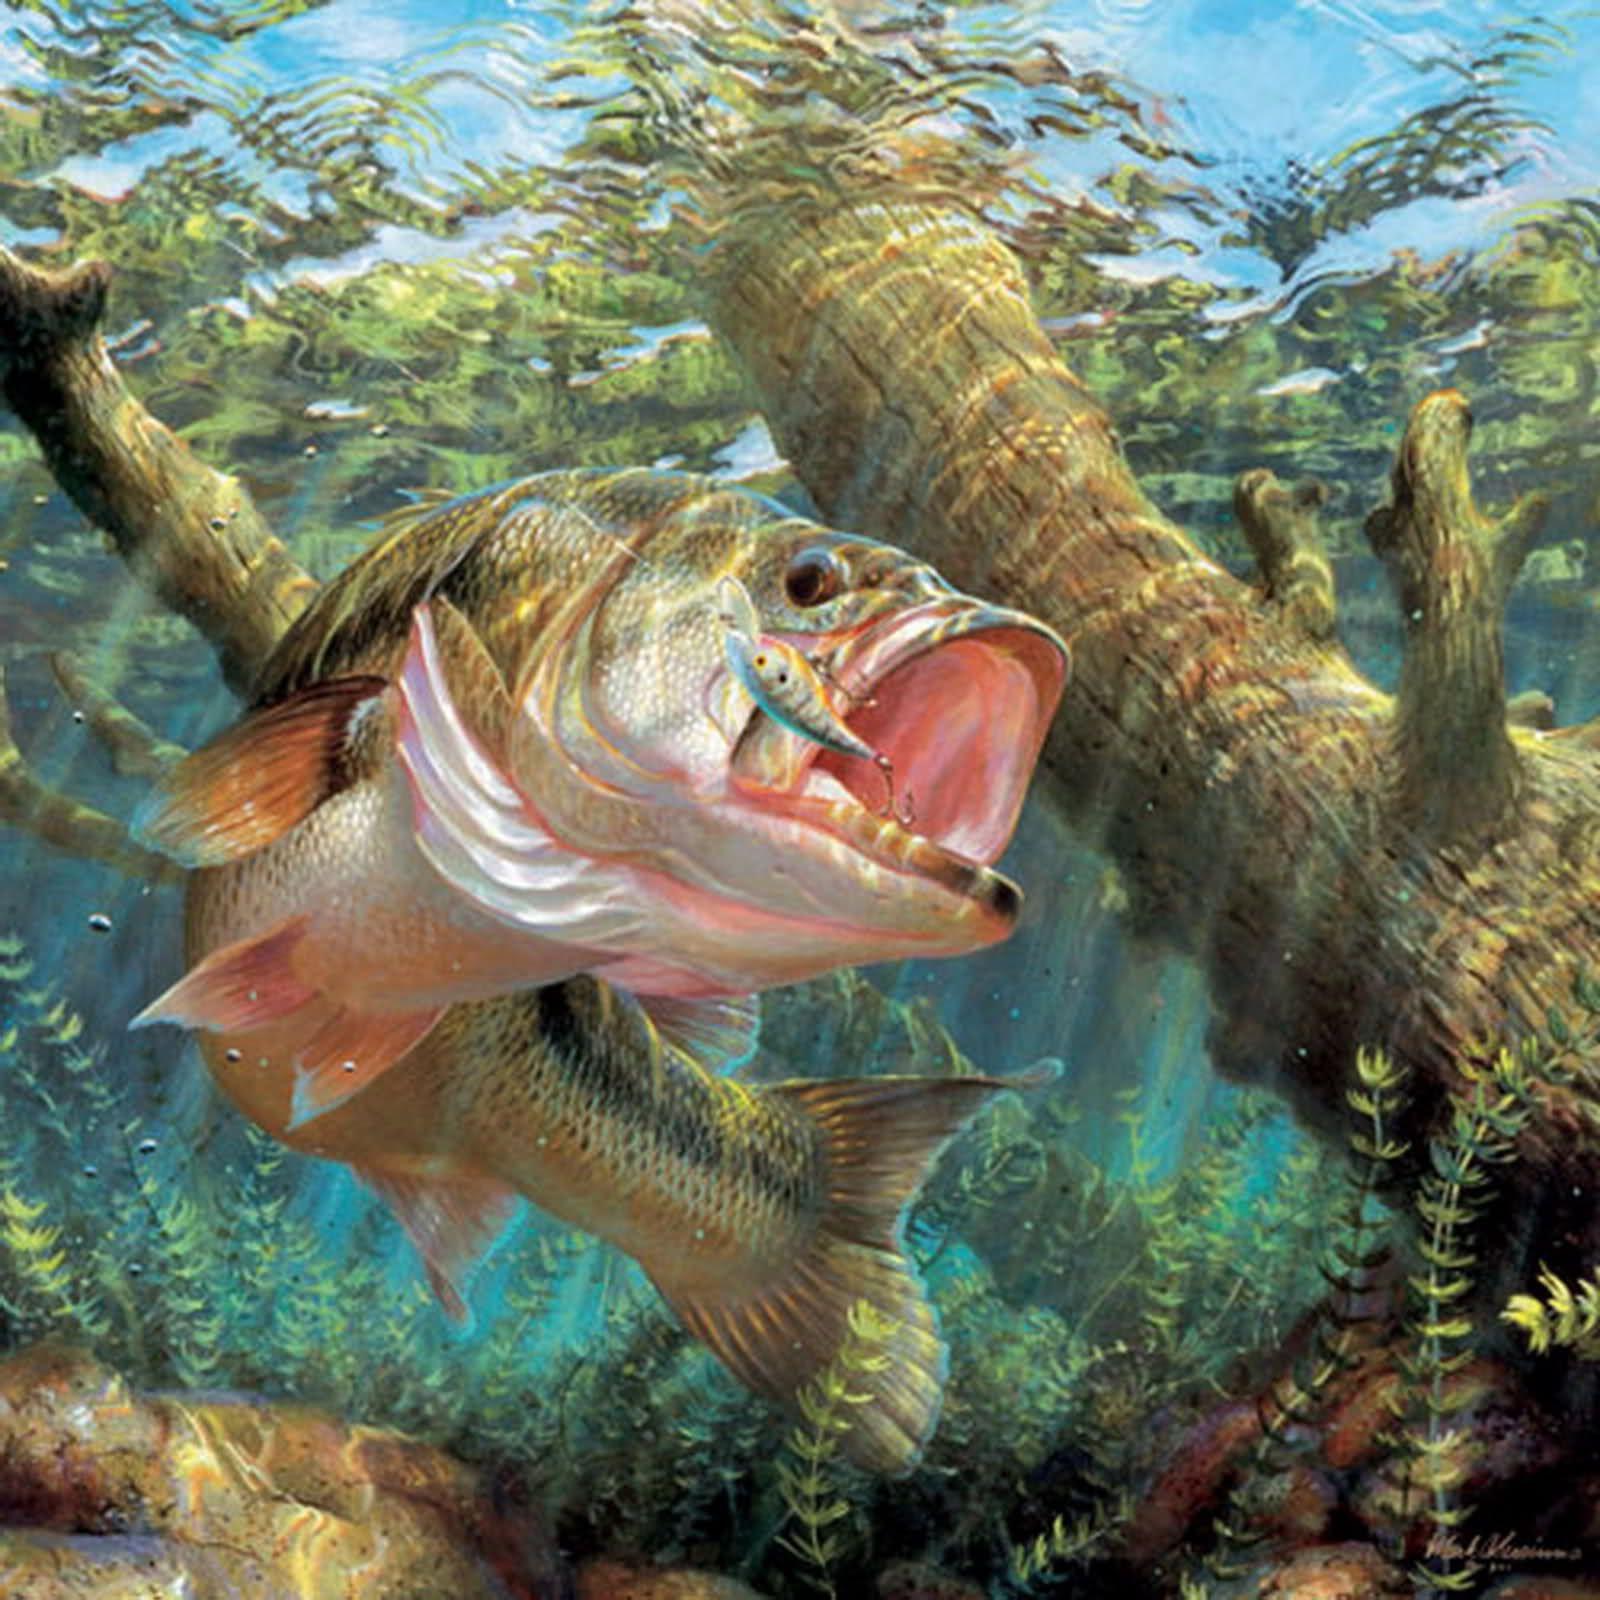 Smallmouth Bass Wallpaper Www Bianoti Com1600 1600buscar Por Imagen Smallmouth Bass Wallpaper Largemouth Bas Kungfu Pai With Images Fish Wallpaper Fish Underwater Lake